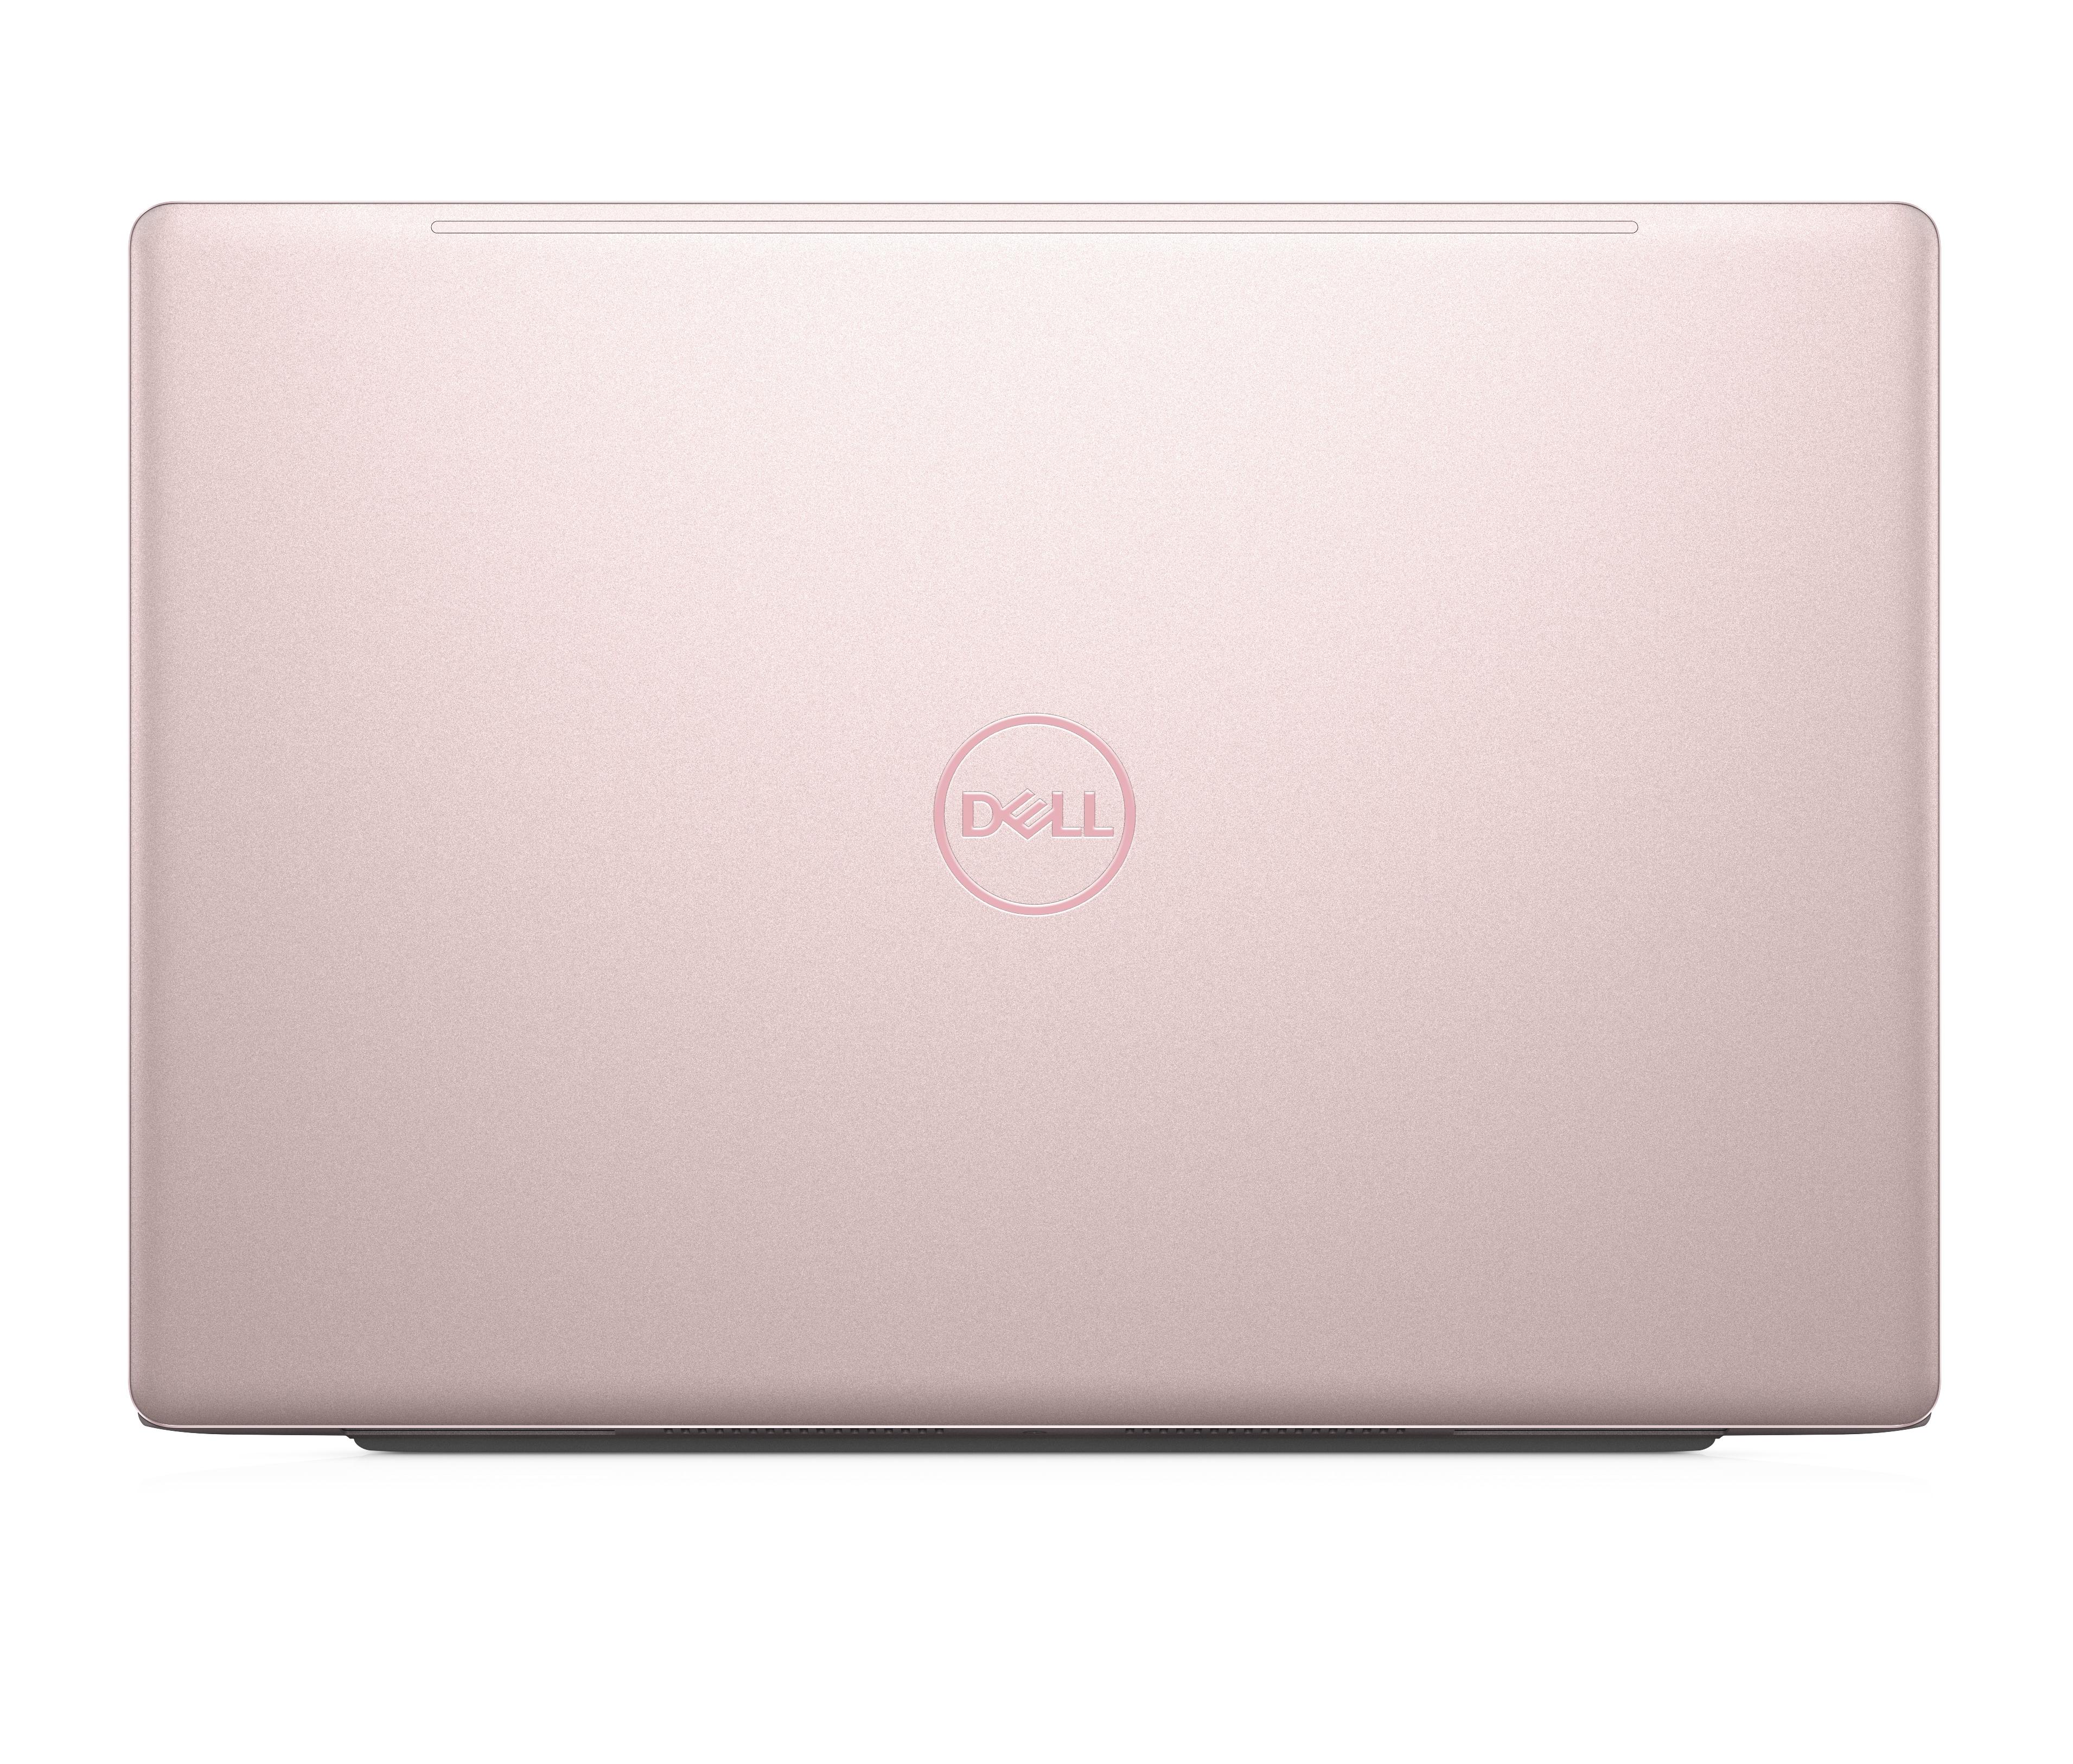 "DELL Inspiron 7570 1.8GHz i7-8550U 15.6"" 1920 x 1080Pixel Nero, Rosa Computer portatile"